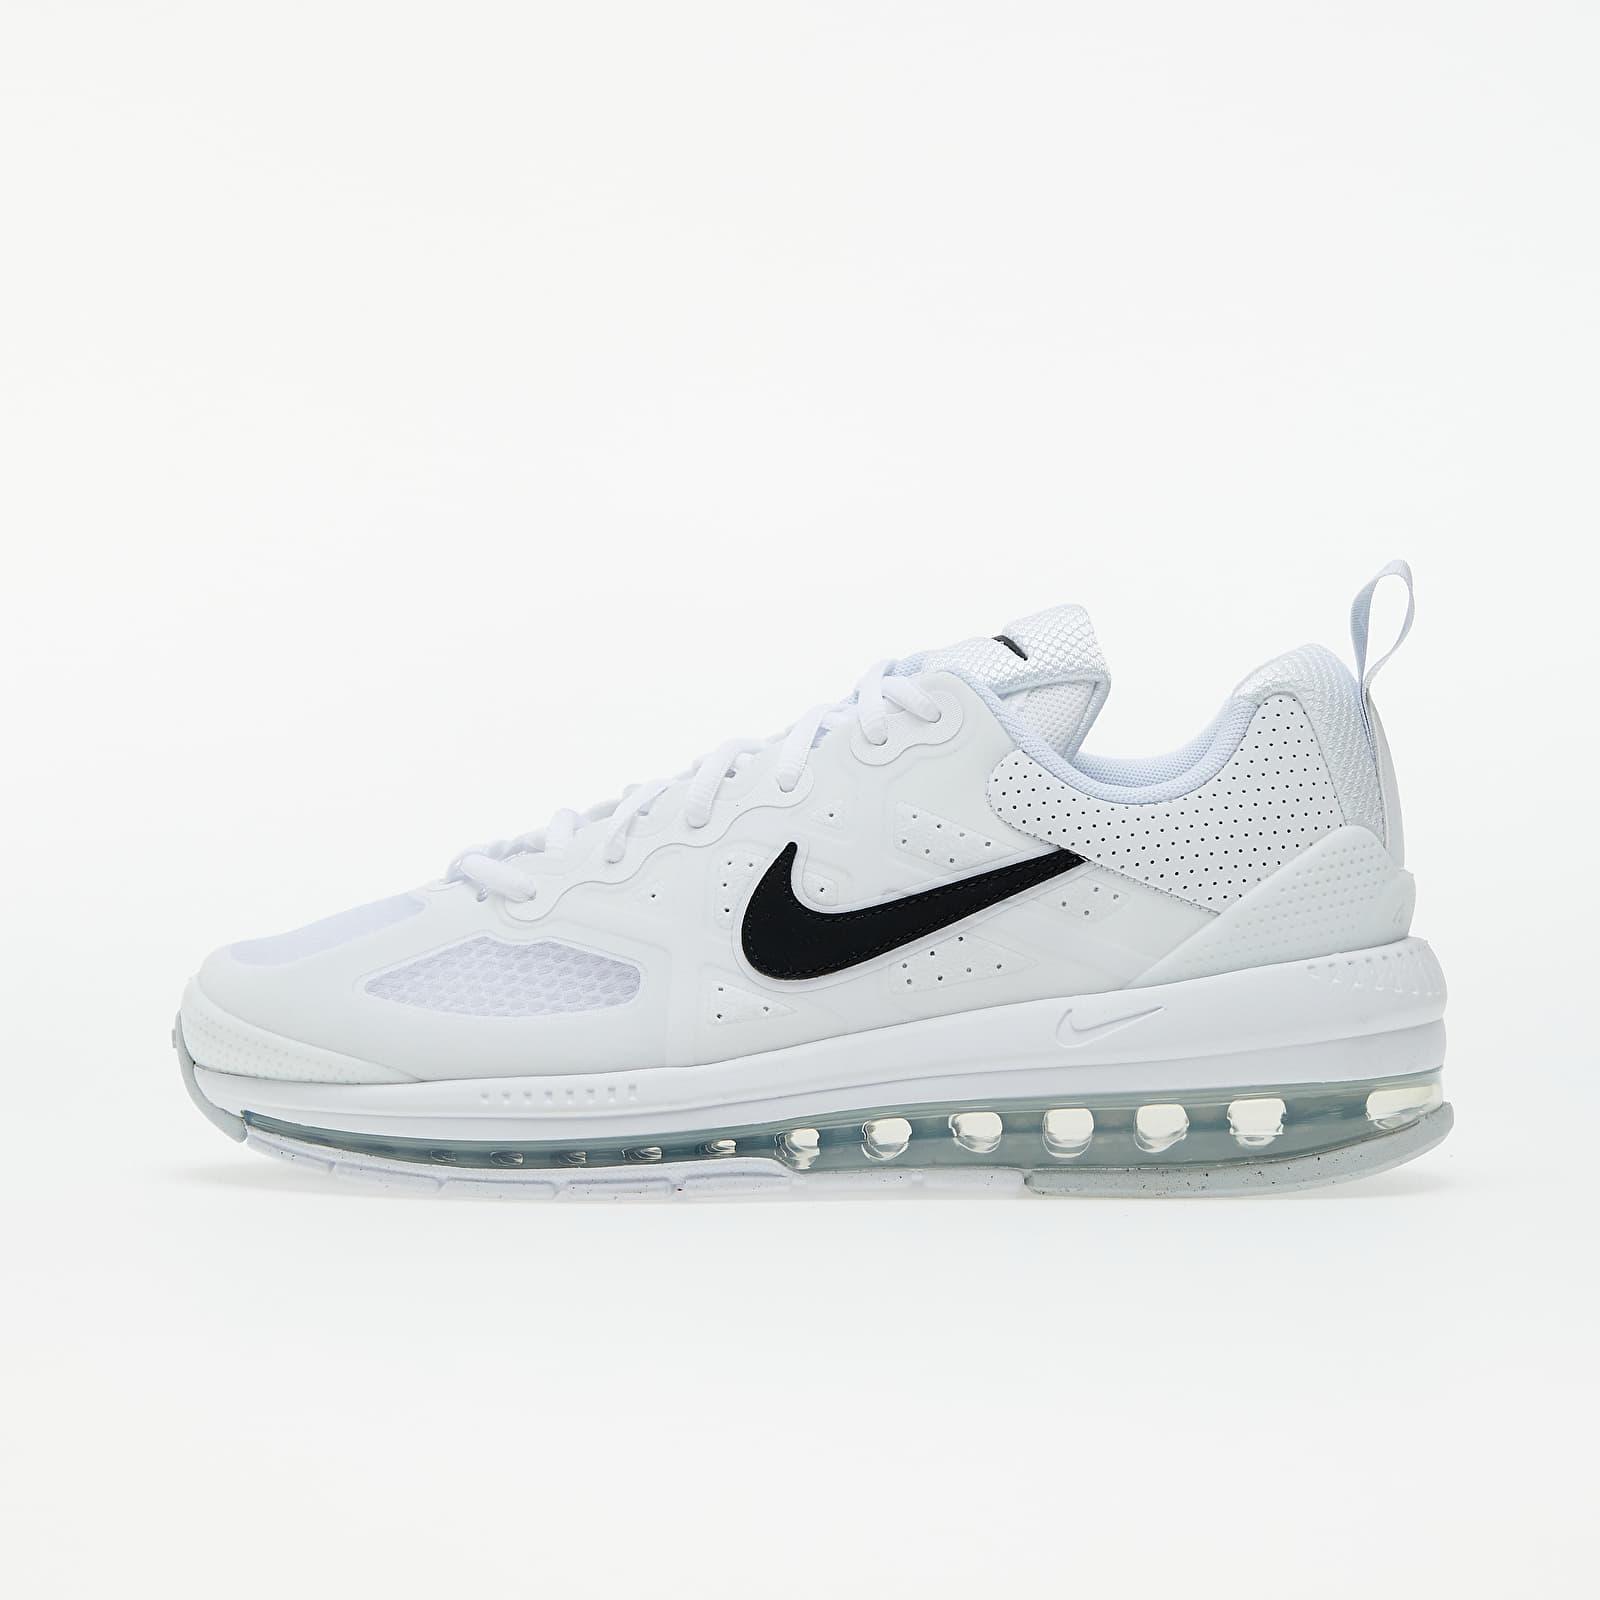 Nike Air Max Genome White/ Black-Pure Platinum EUR 42